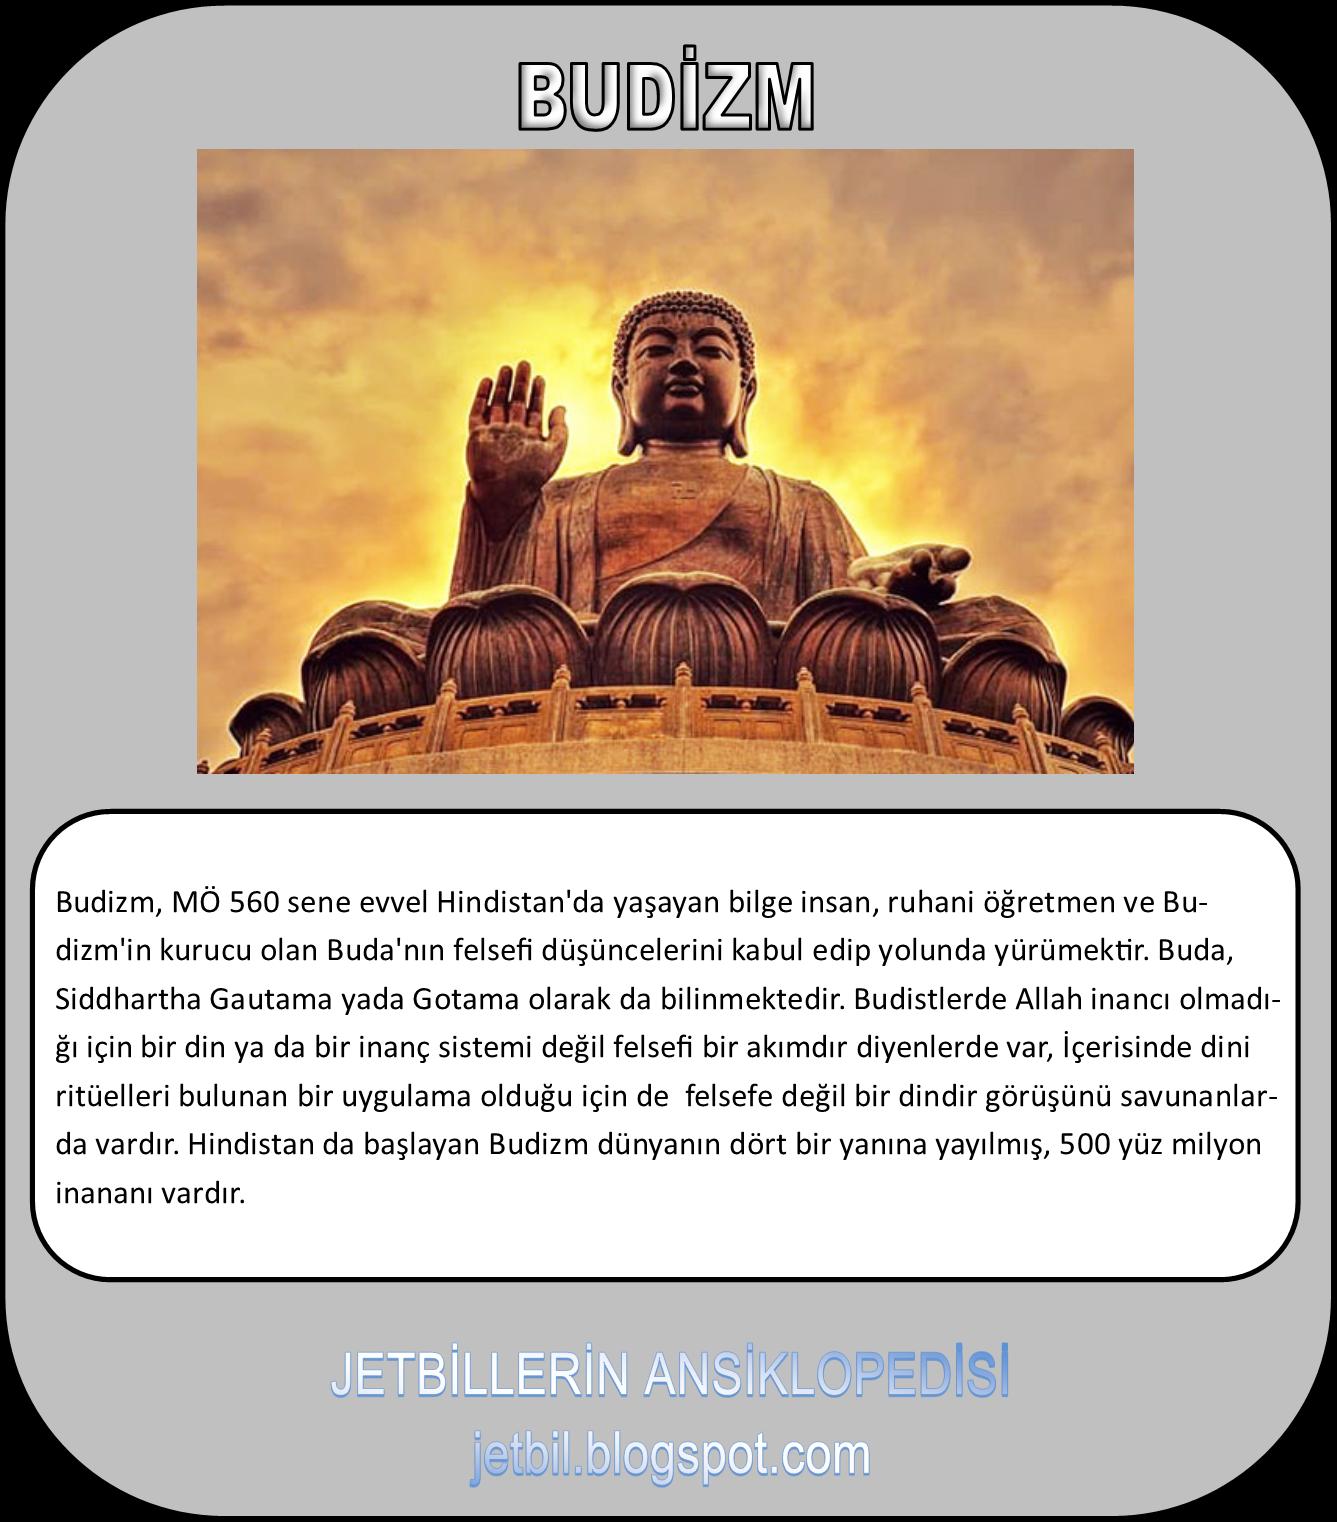 Budizm nedir